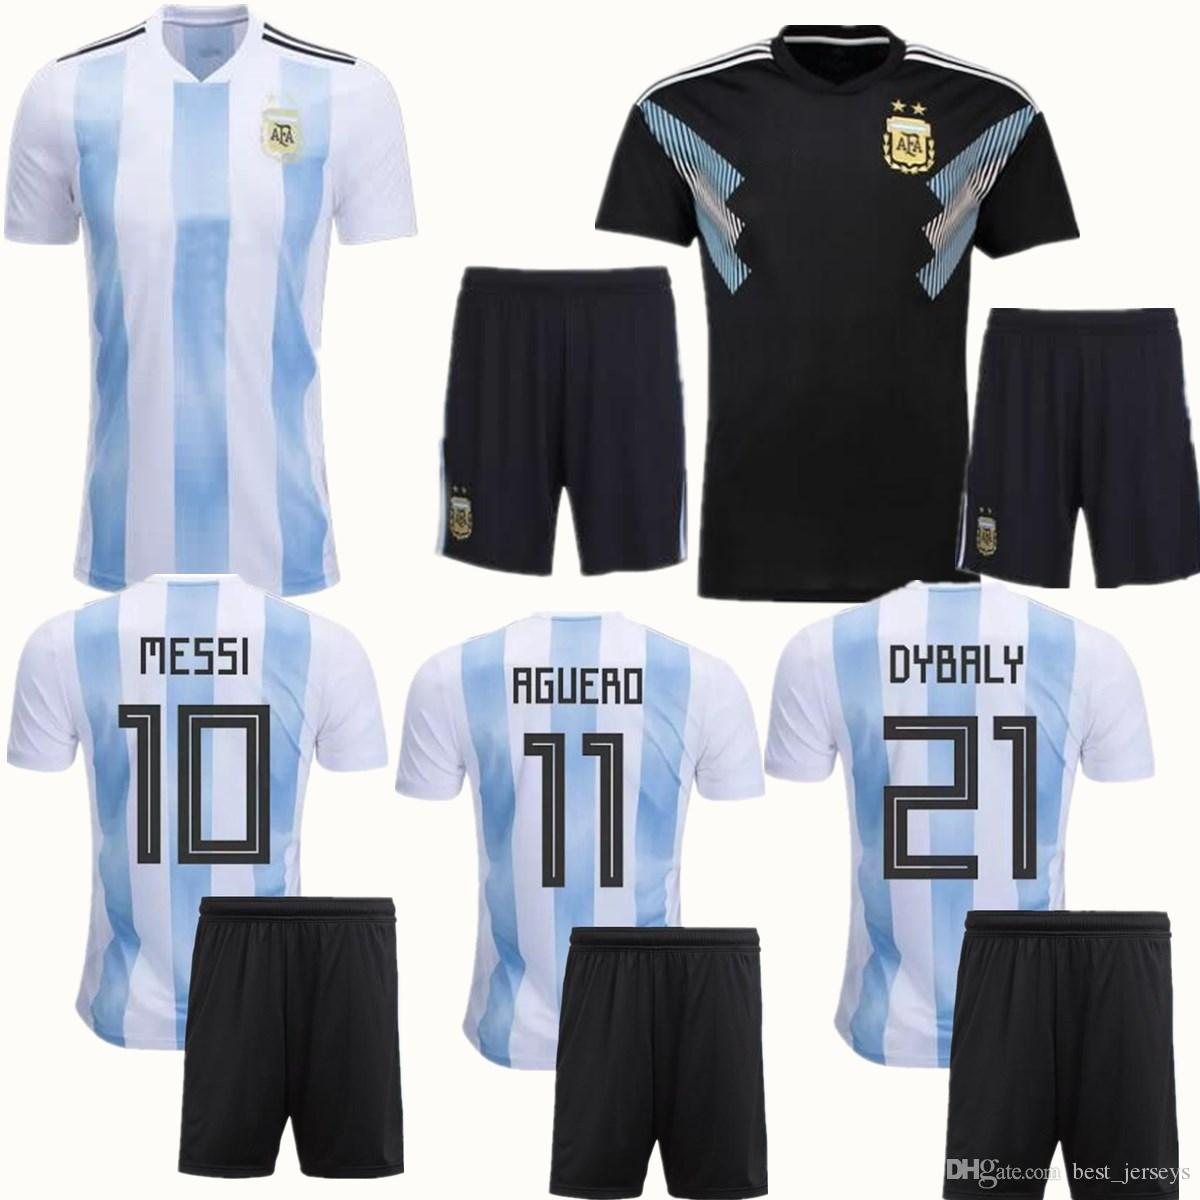 2d0f17d0f8196 Compre Copa Mundial 2018 Argentina Selecciones De Fútbol Visitante MESSI DI  MARIA AGUERO KOMPANY DYBALA Jersey Visitante Black Kit Adultos Uniforme ...